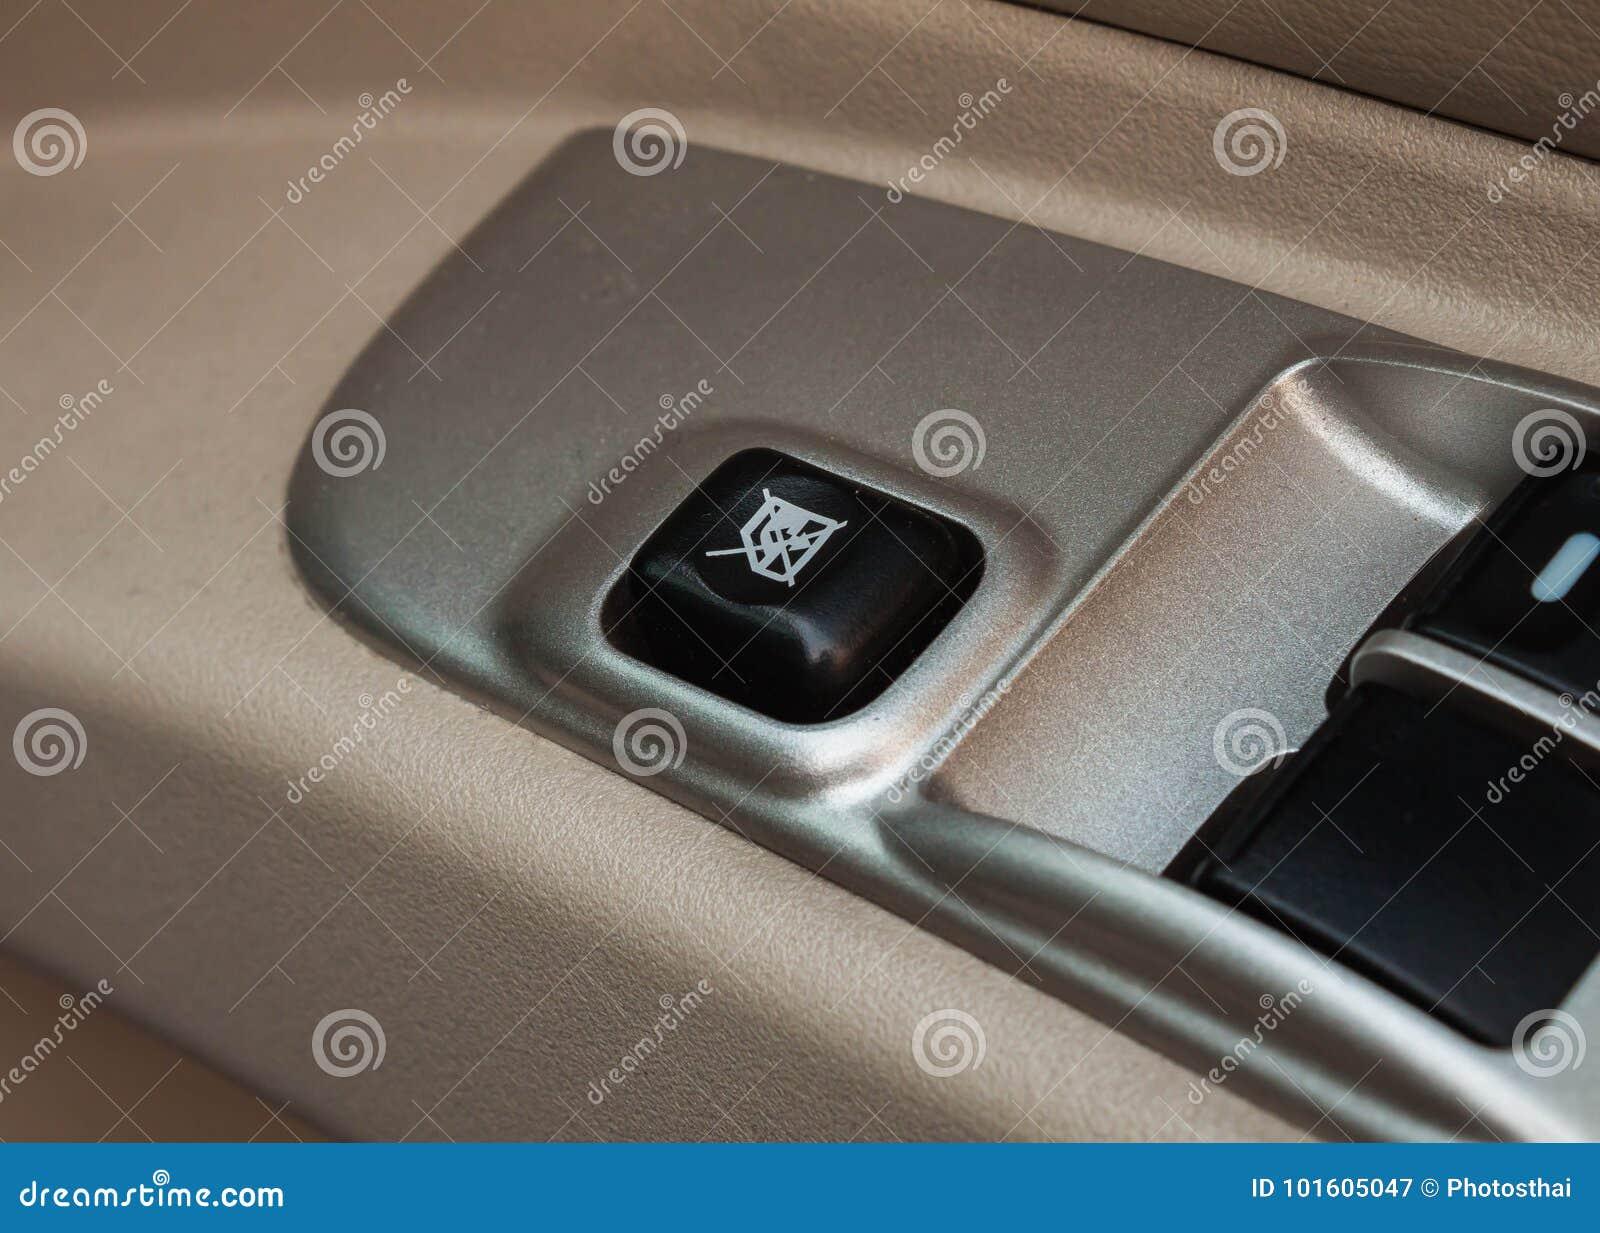 Symbol Door Lock Buttons In Auto Car Stock Image Image Of